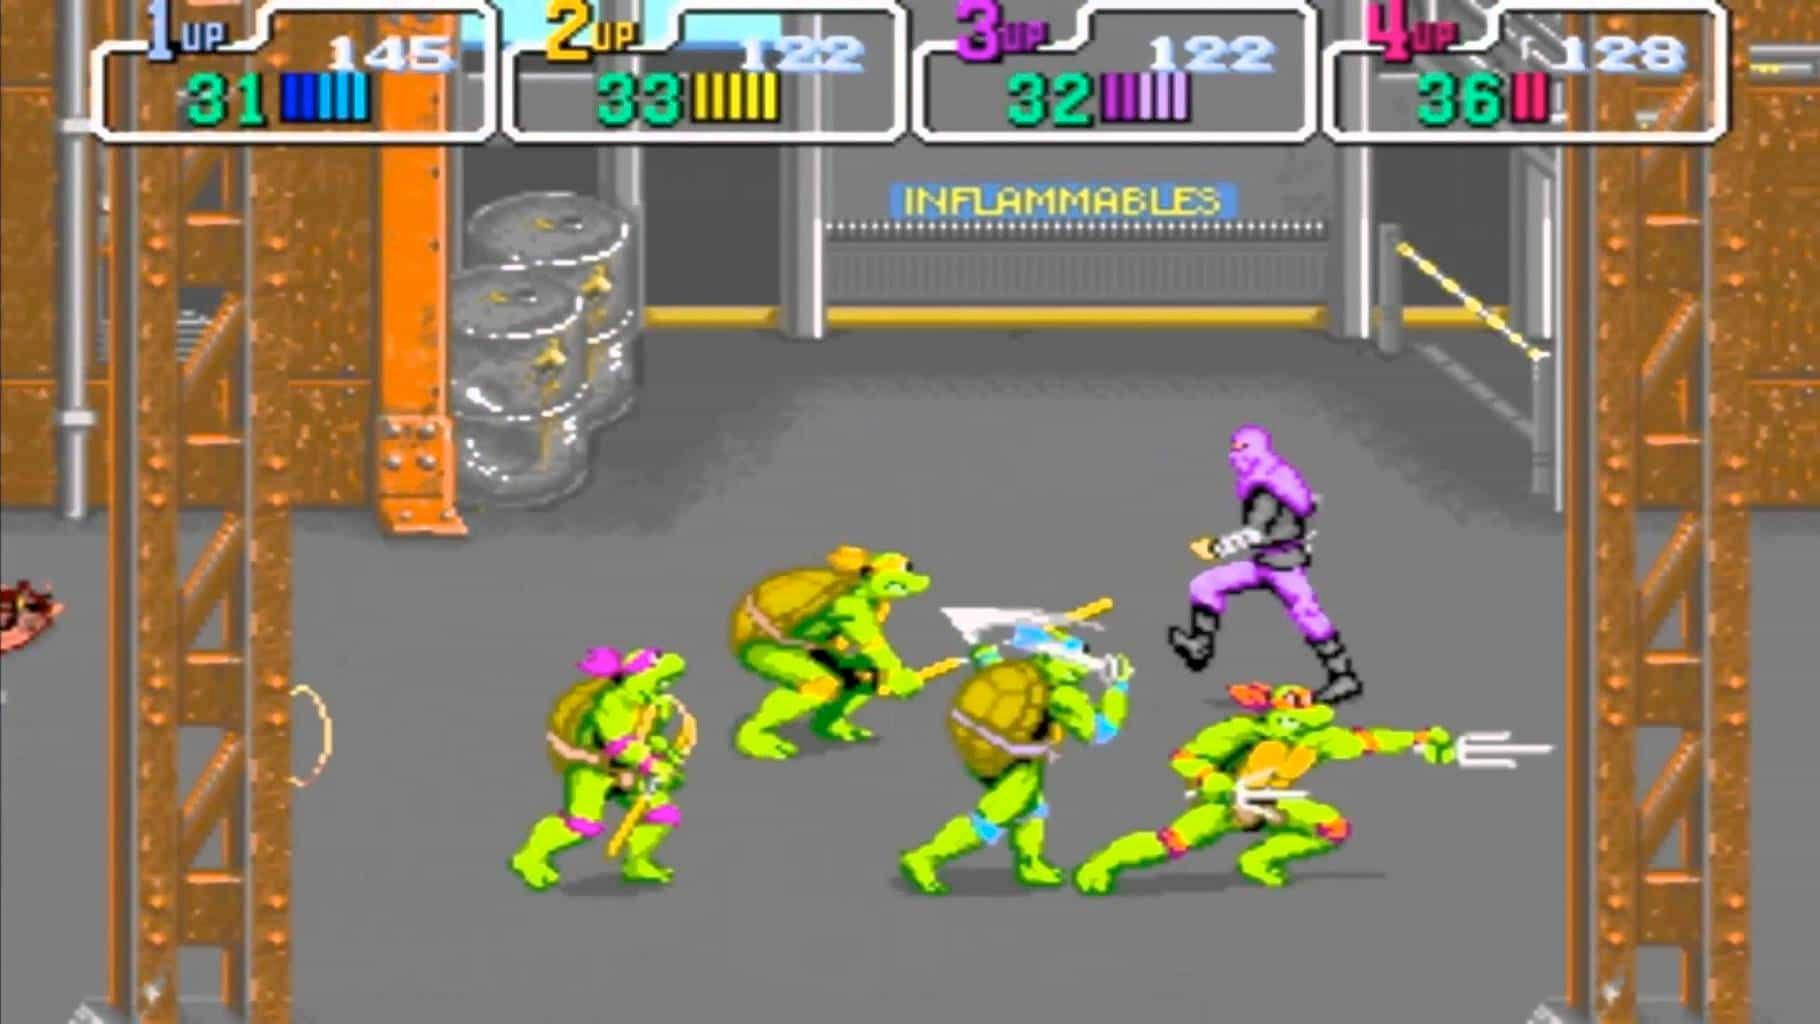 https://www.slashfilm.com/wp/wp-content/images/tmnt-arcadegame-screenshot.jpg